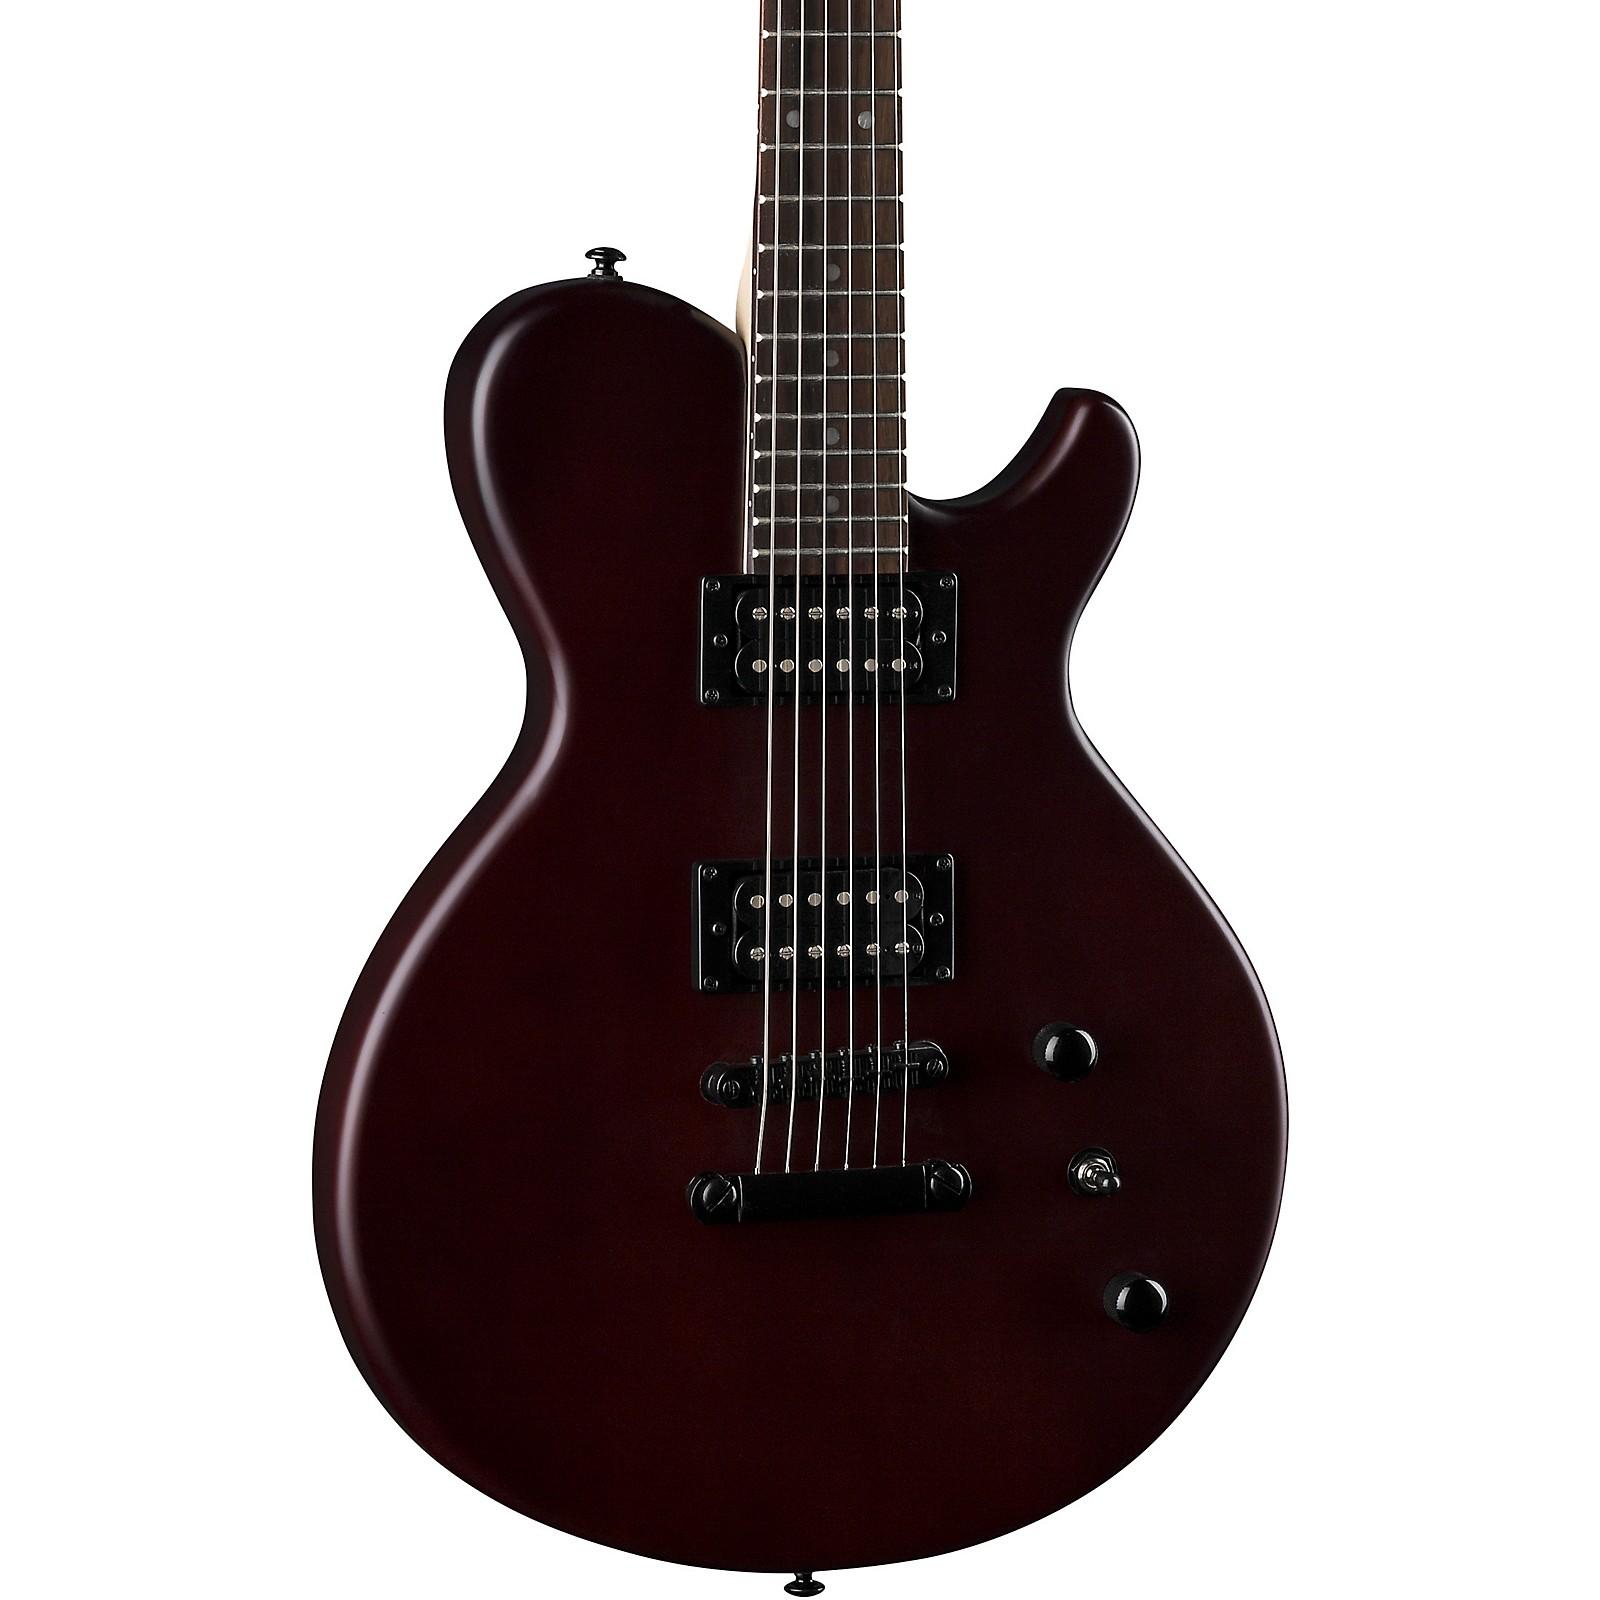 Dean Evo XM Electric Guitar